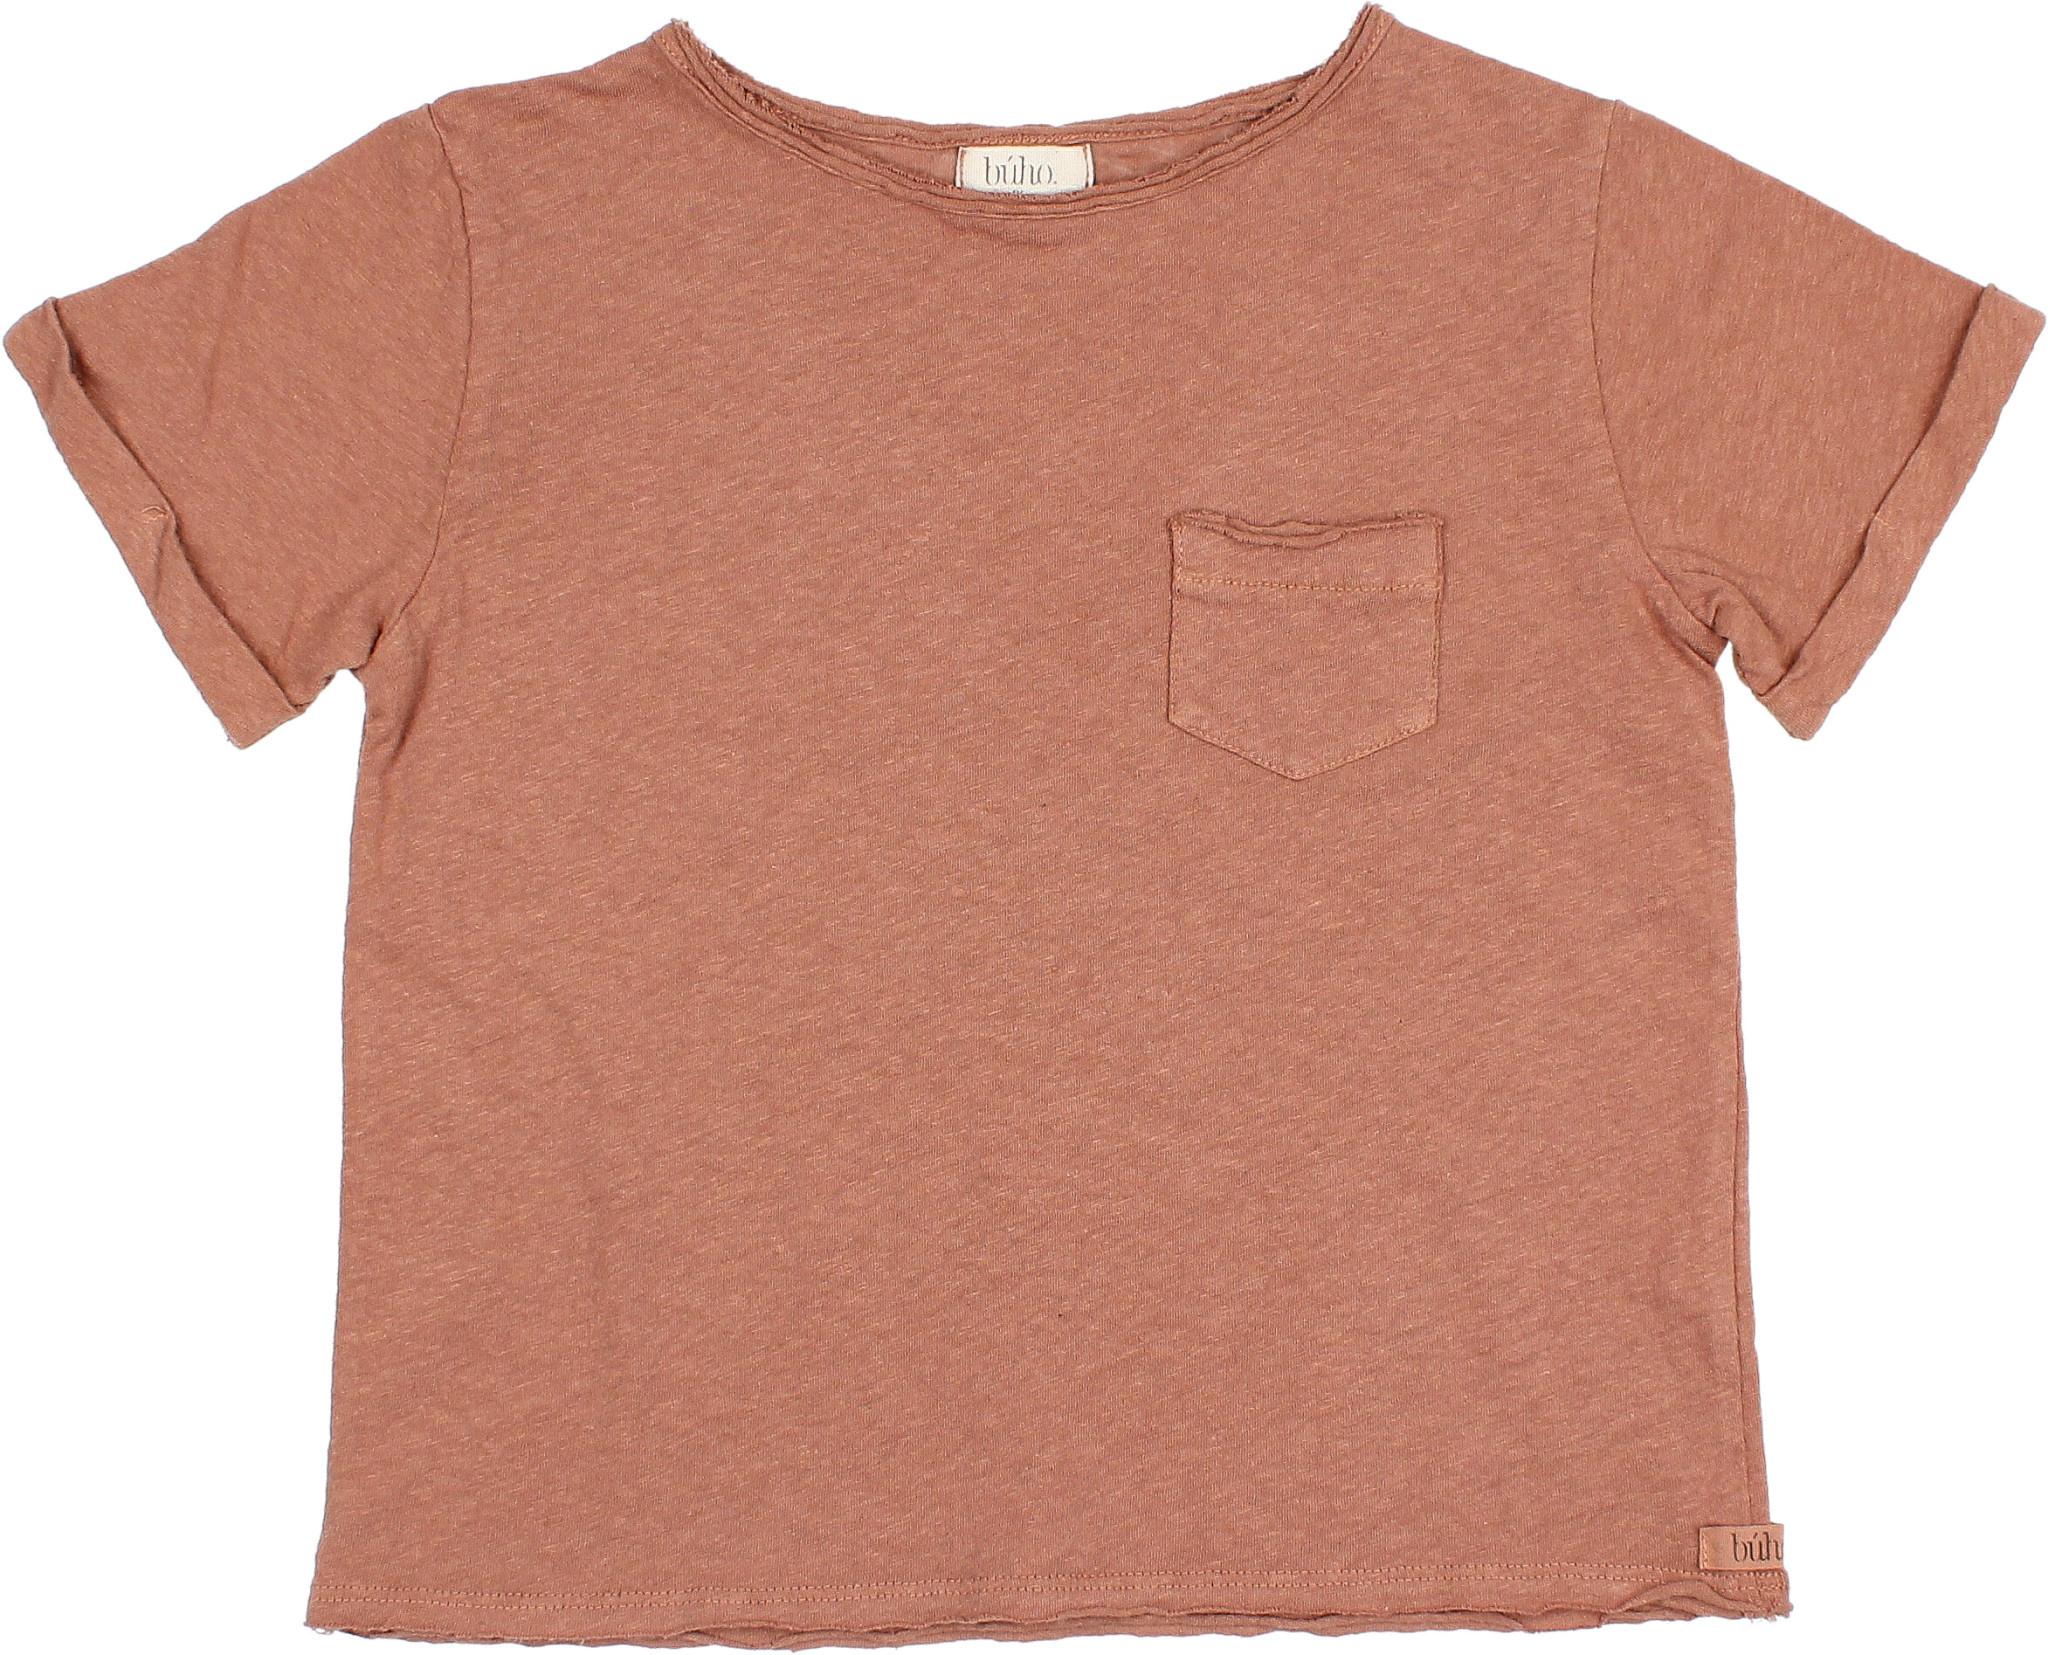 James t-shirt cocoa-4